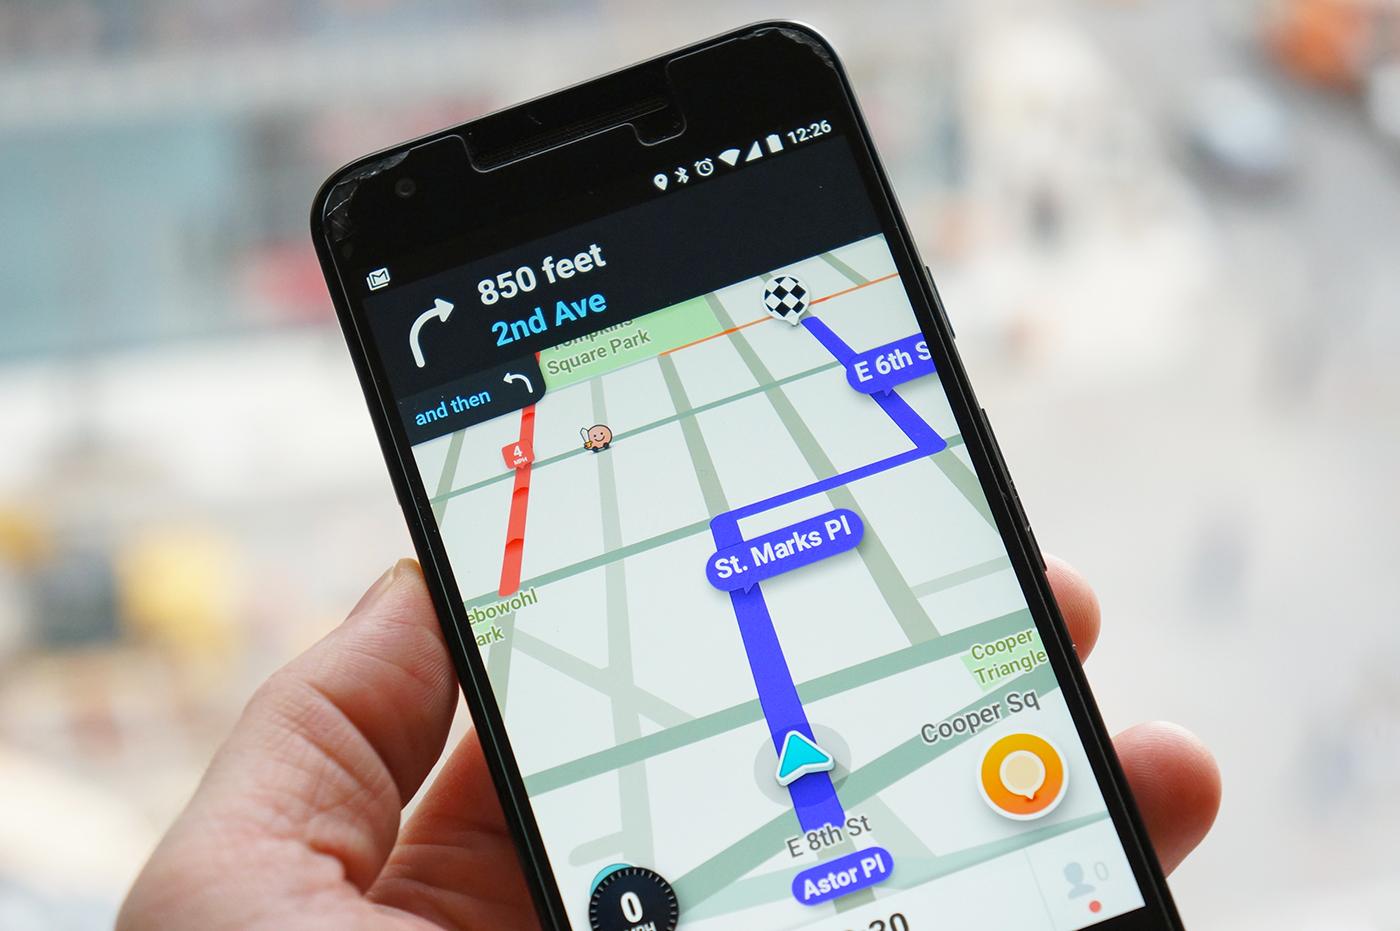 Waze's app